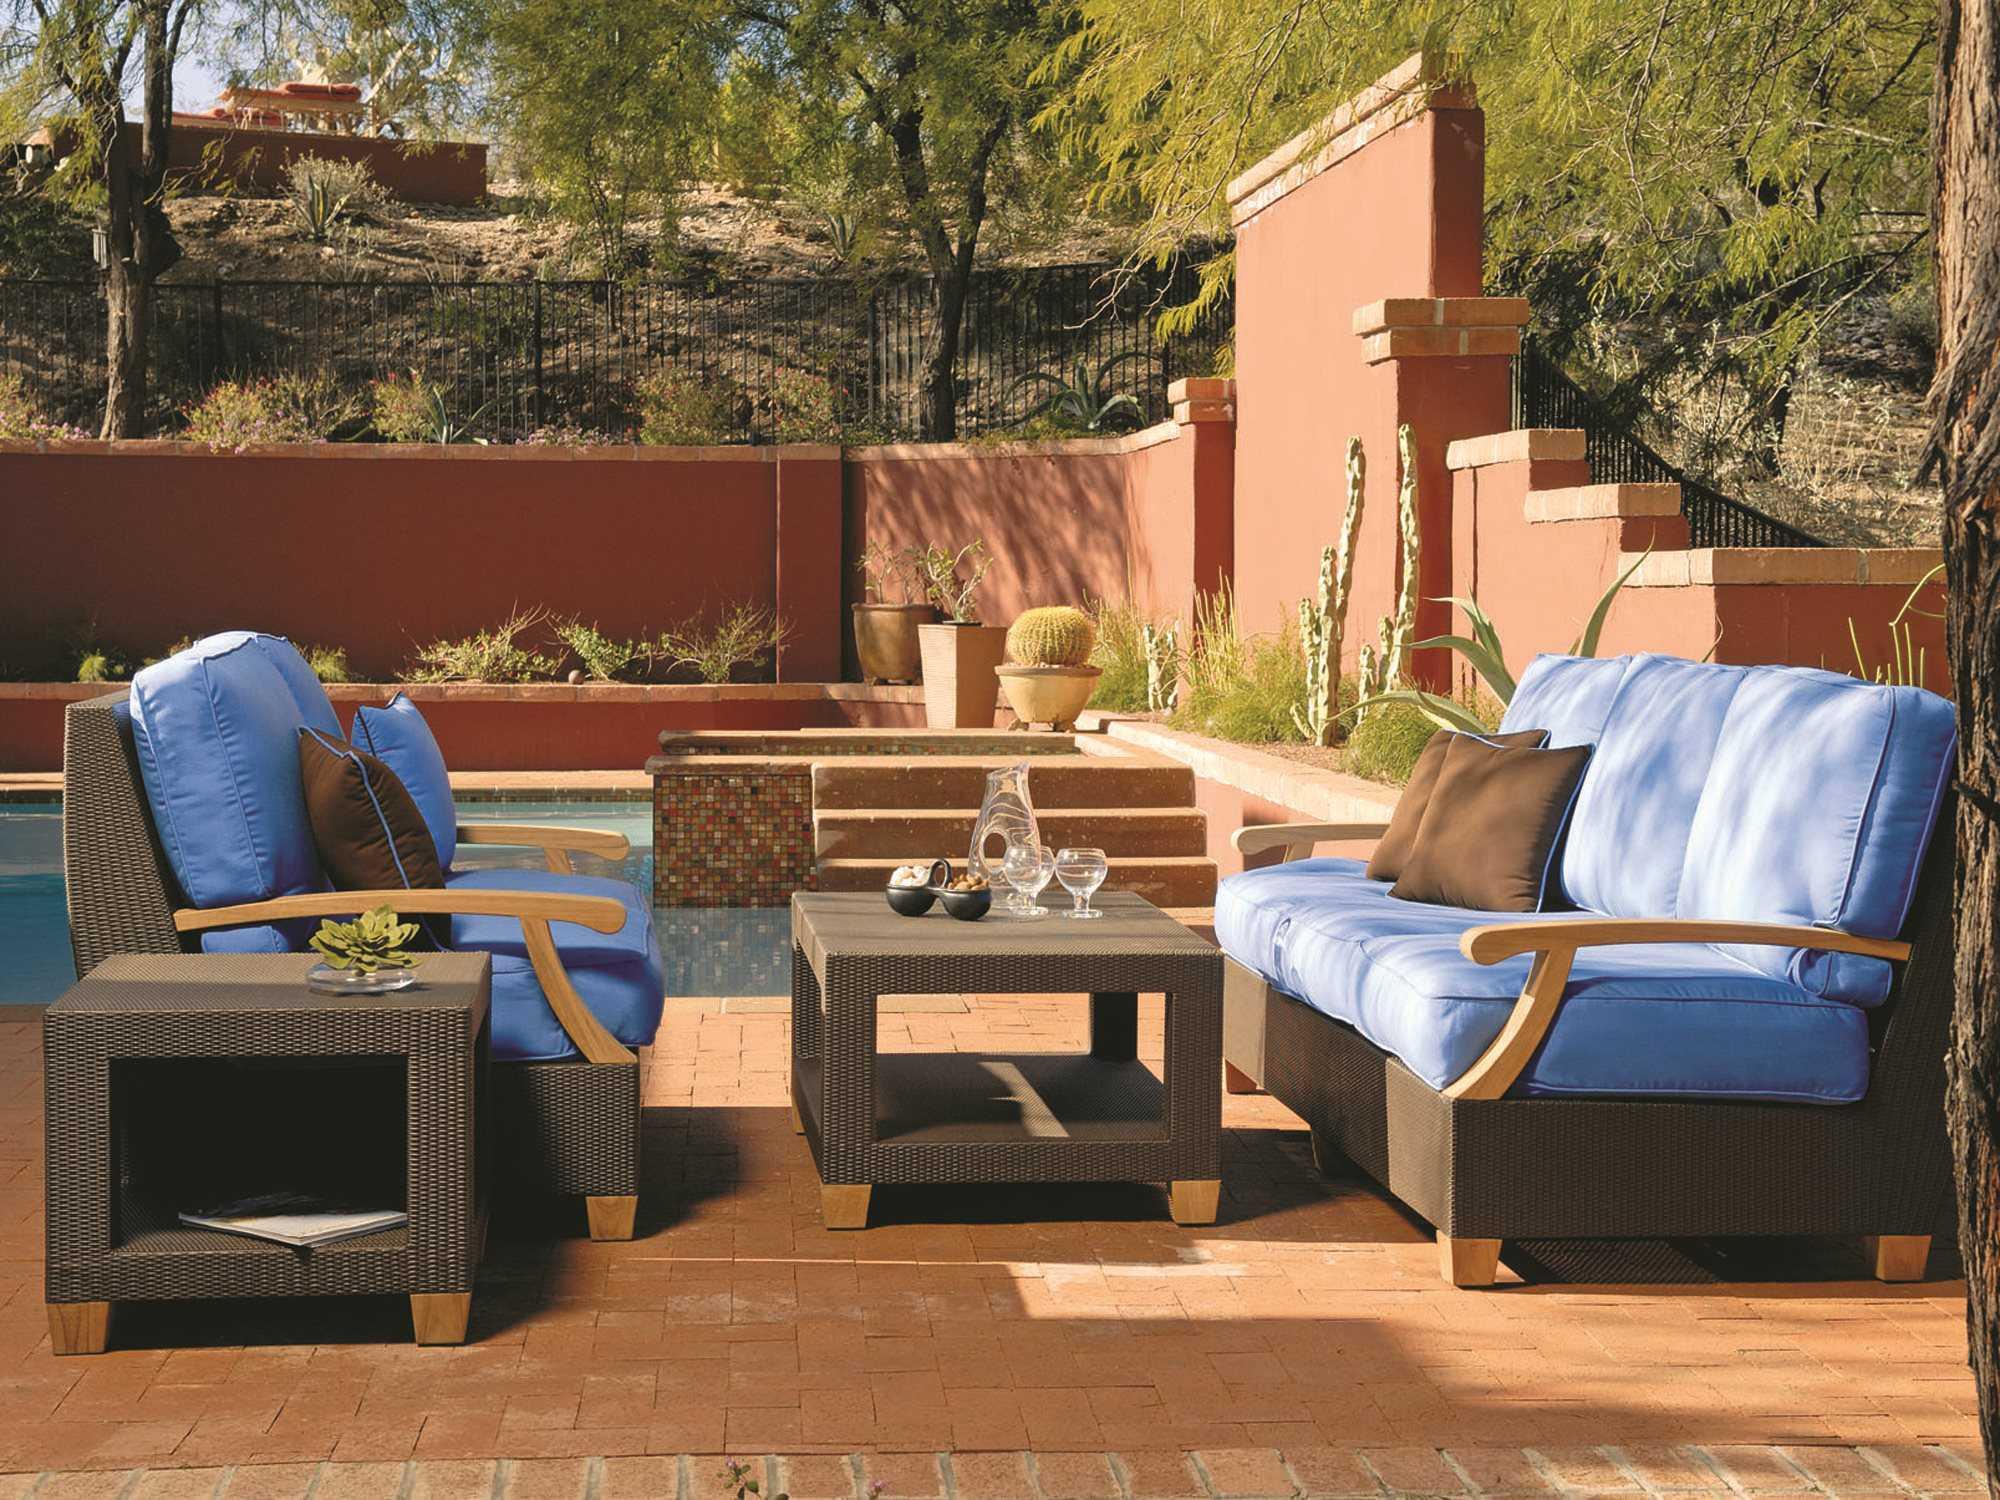 Phenomenal Three Birds Casual Ciera Wicker Lounge Set Inzonedesignstudio Interior Chair Design Inzonedesignstudiocom